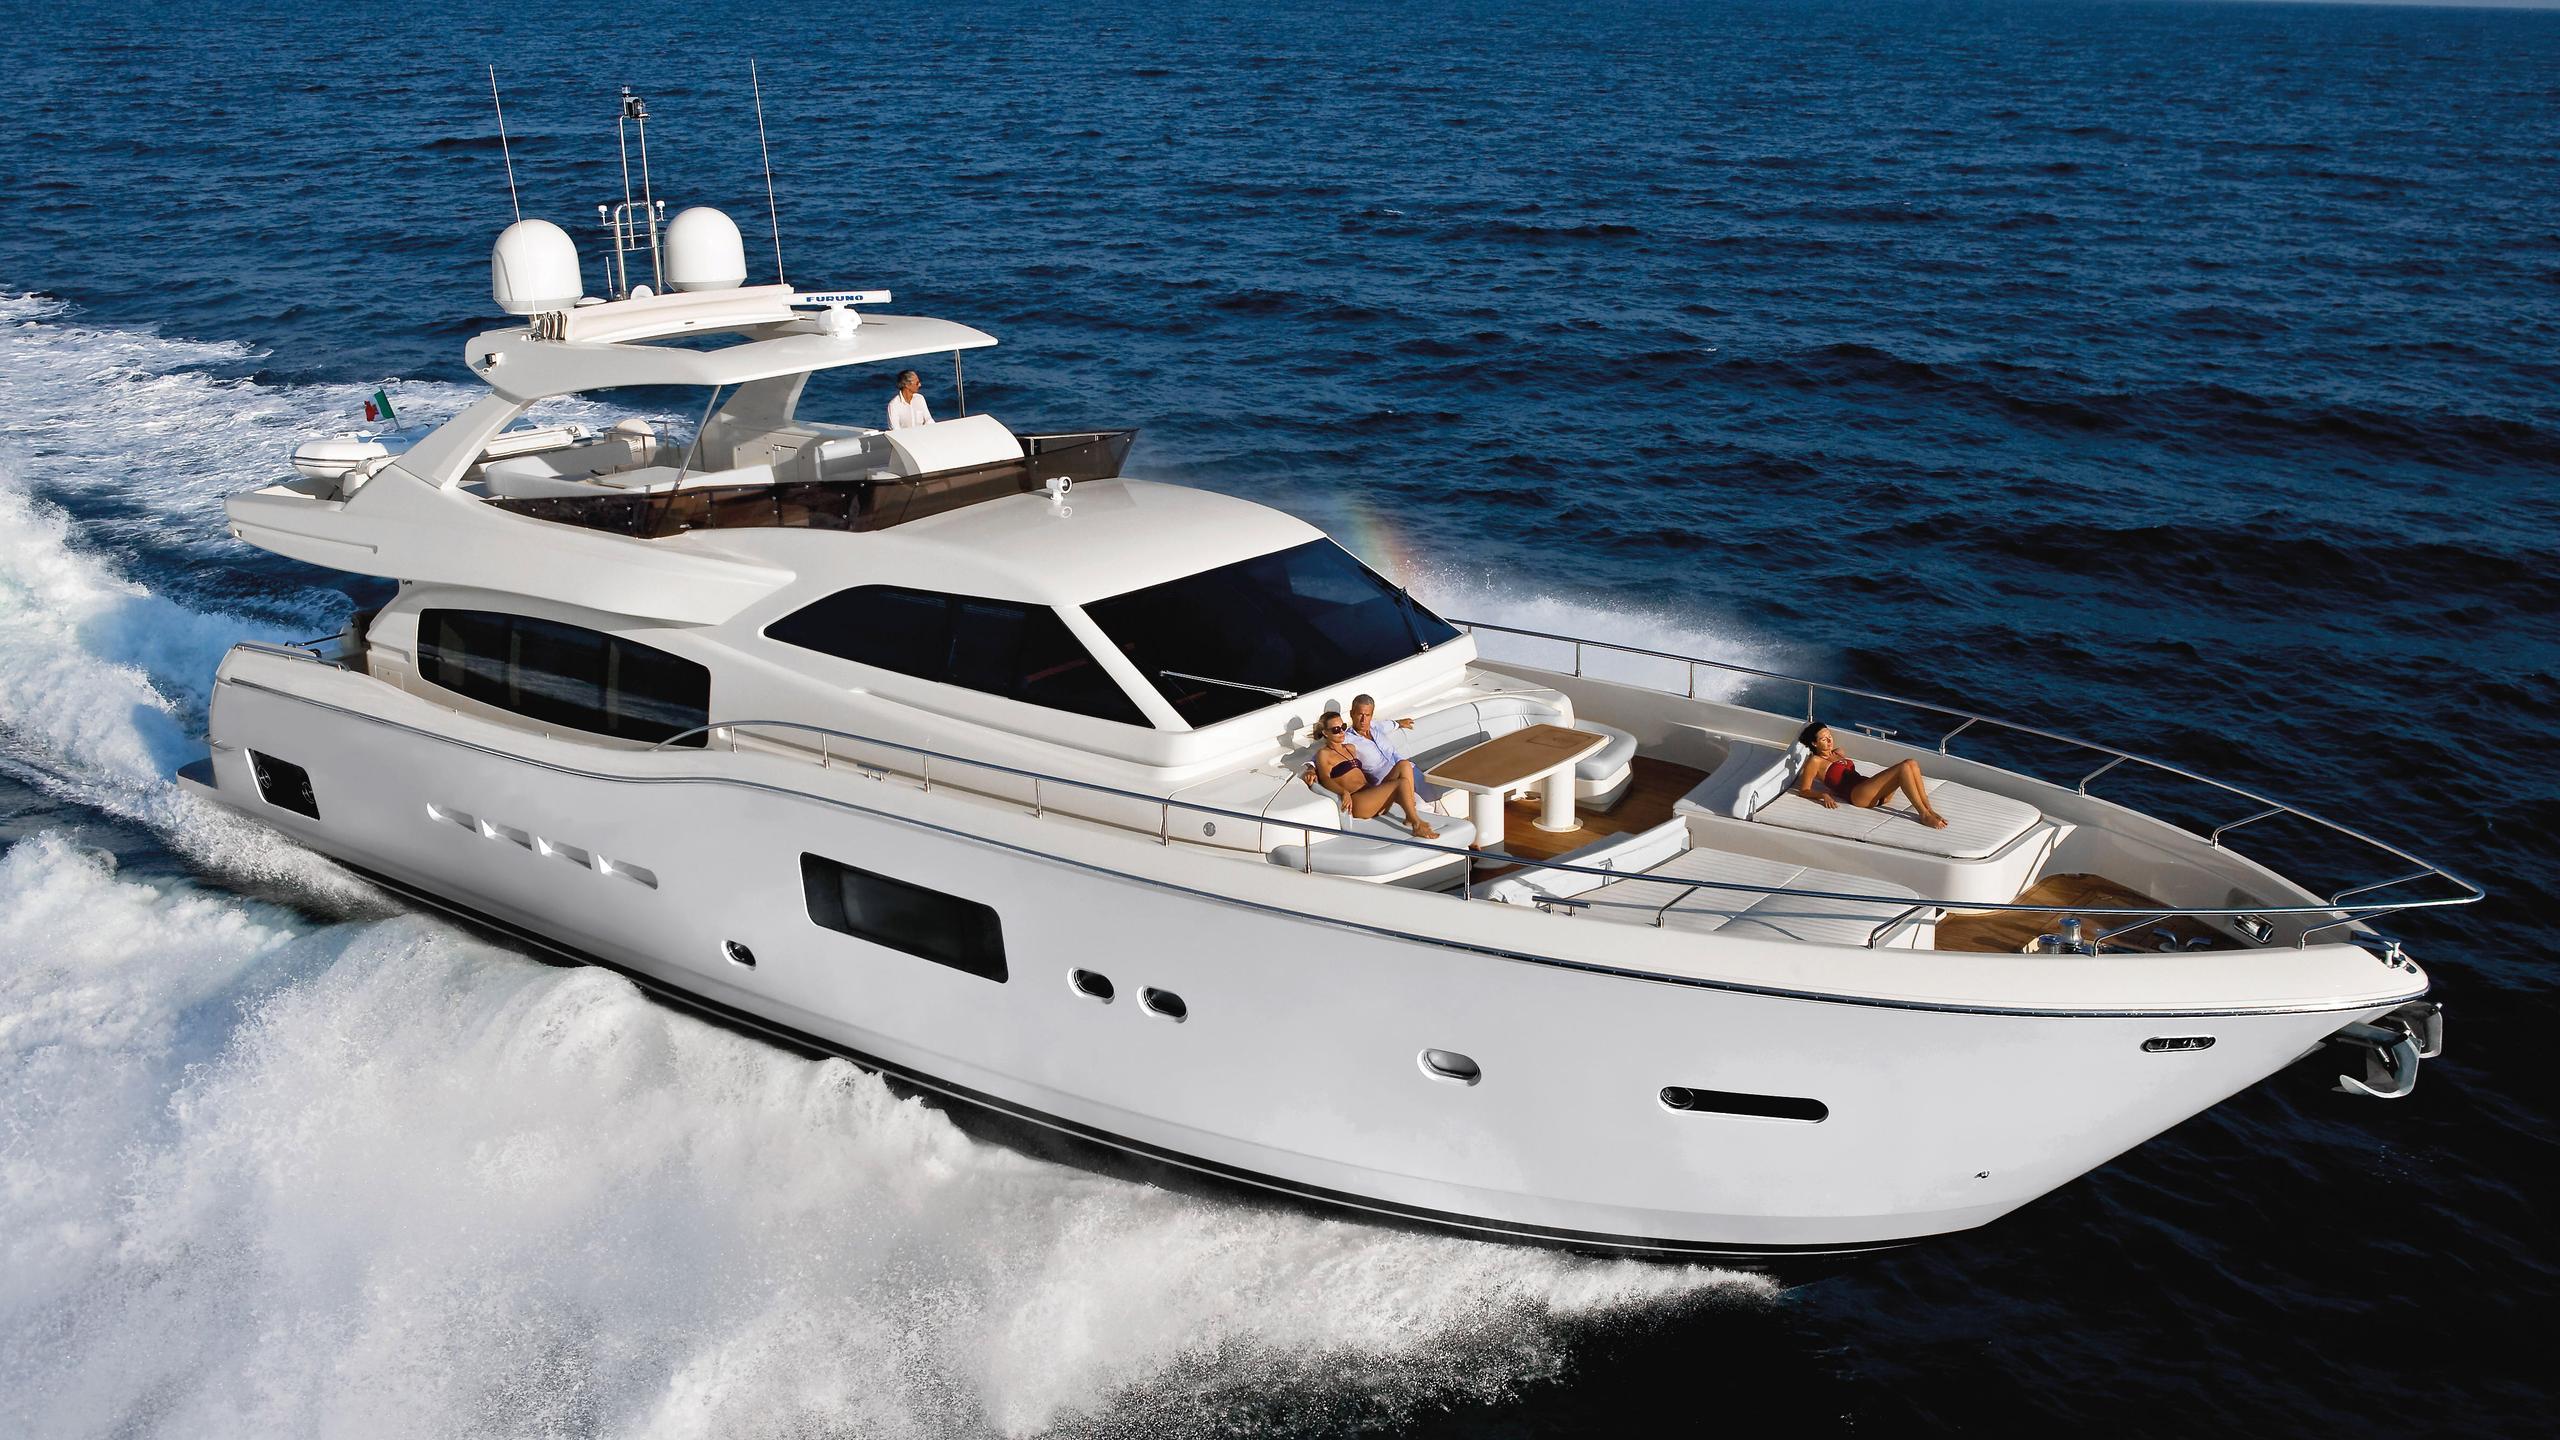 ferretti-altura-840-05-motor-yacht-ferretti-altura-840-2012-26m-cruising